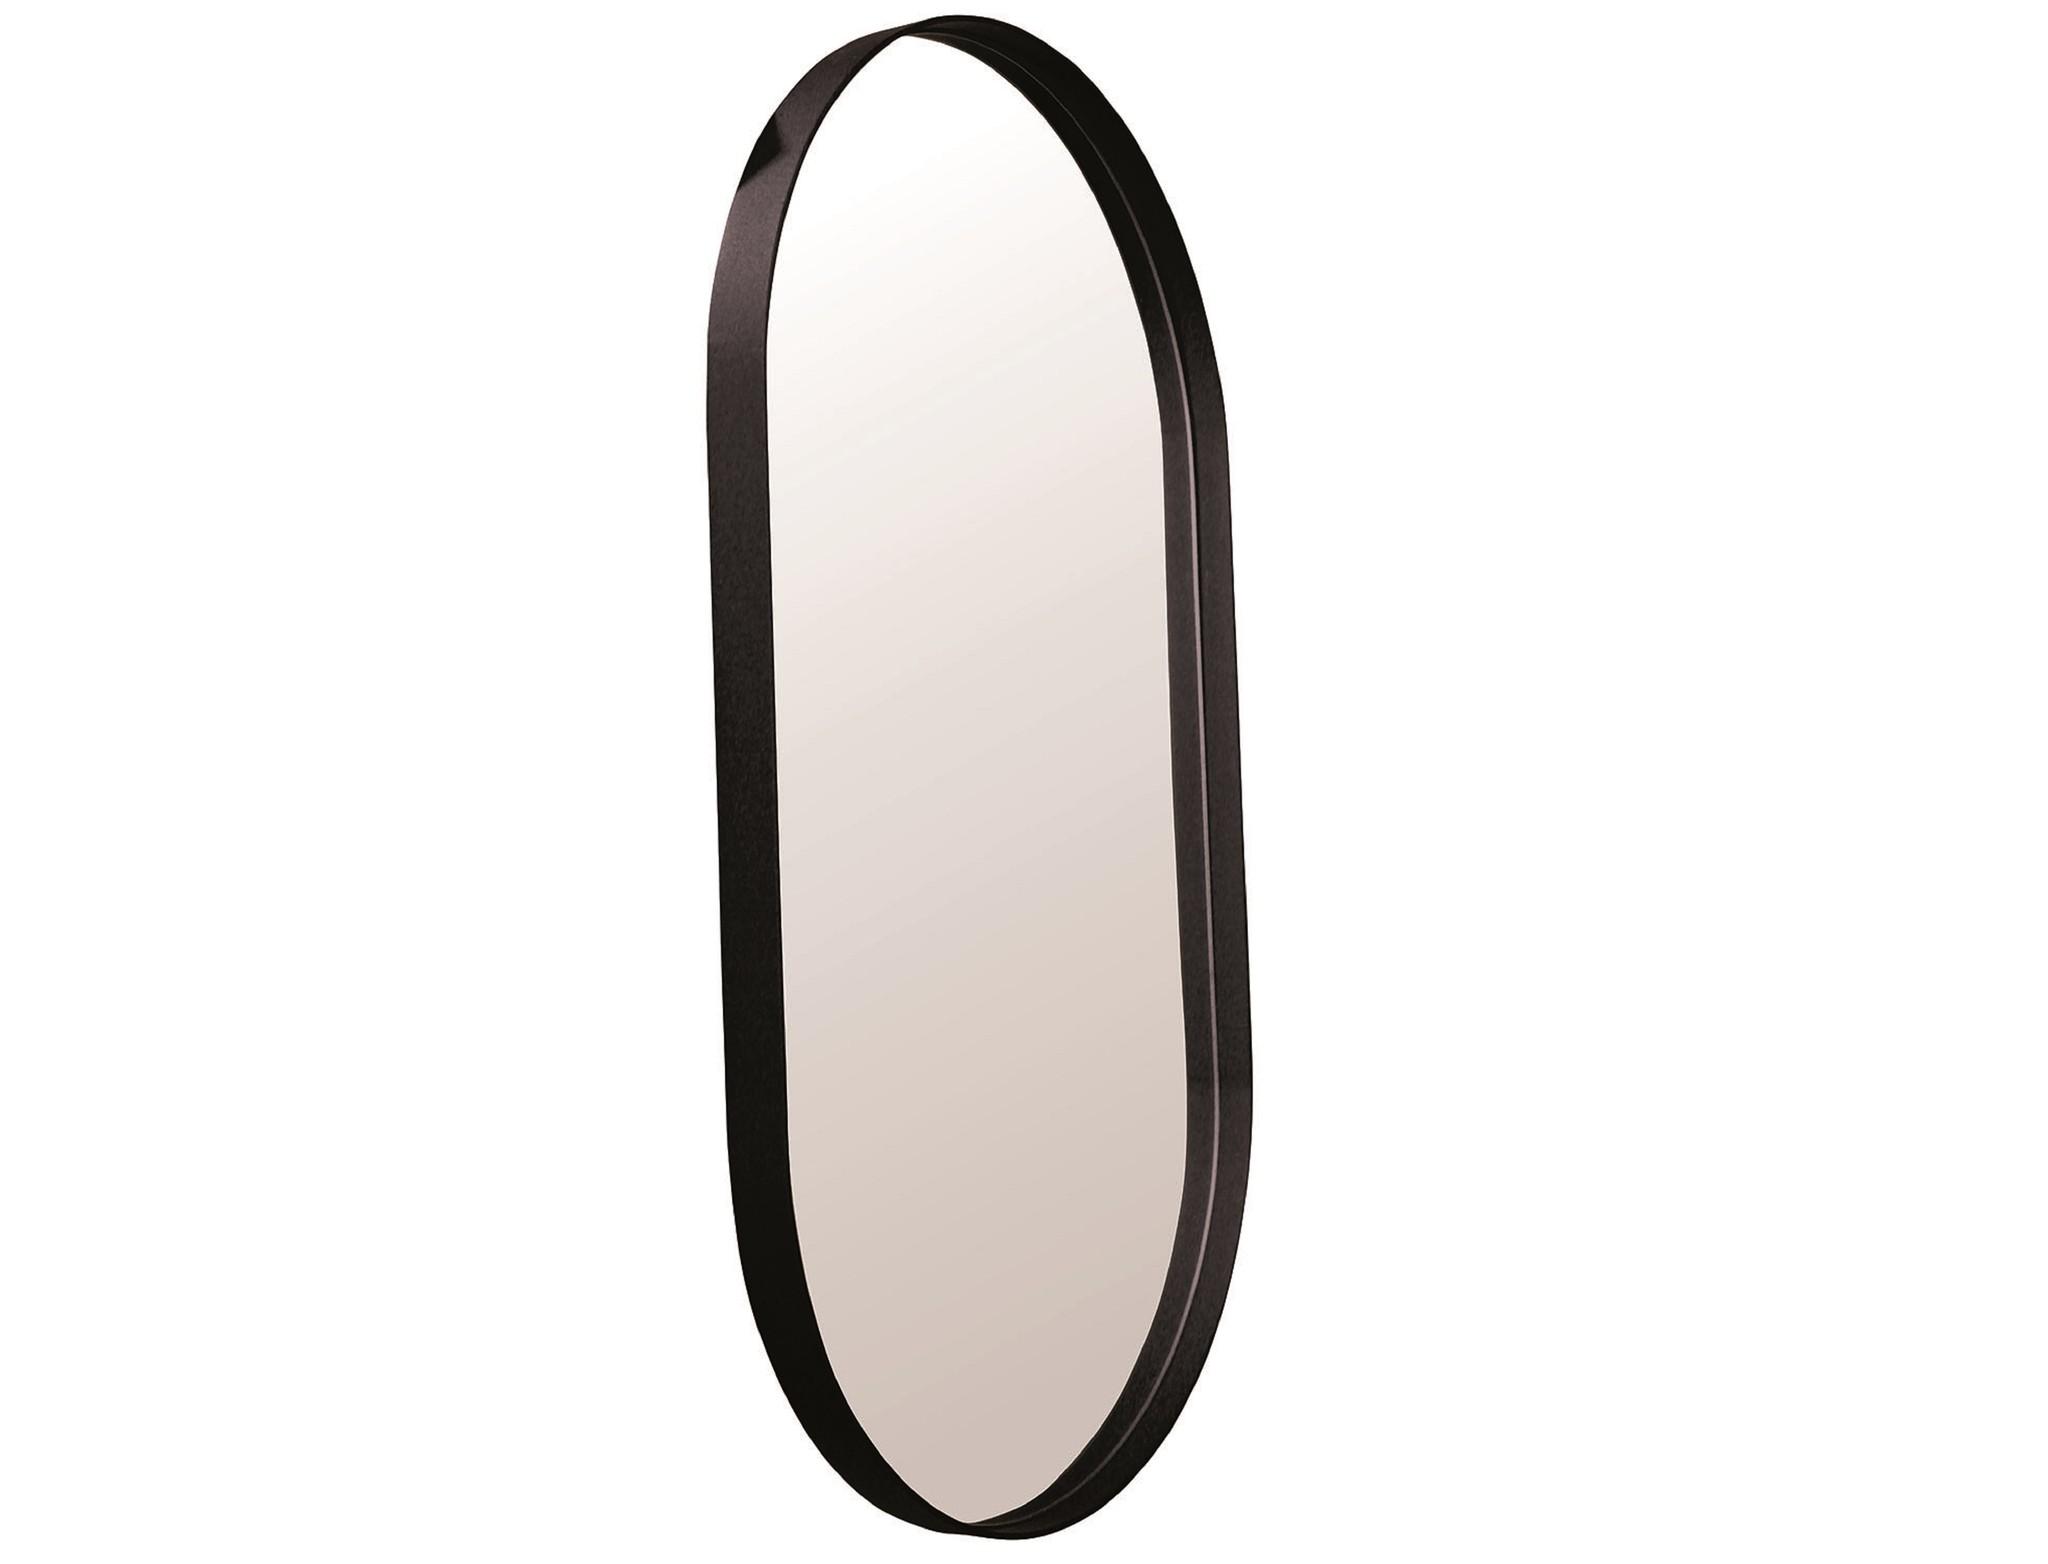 Настенное зеркало ванда 120*50 (simple mirror) черный 50x120x4 см.